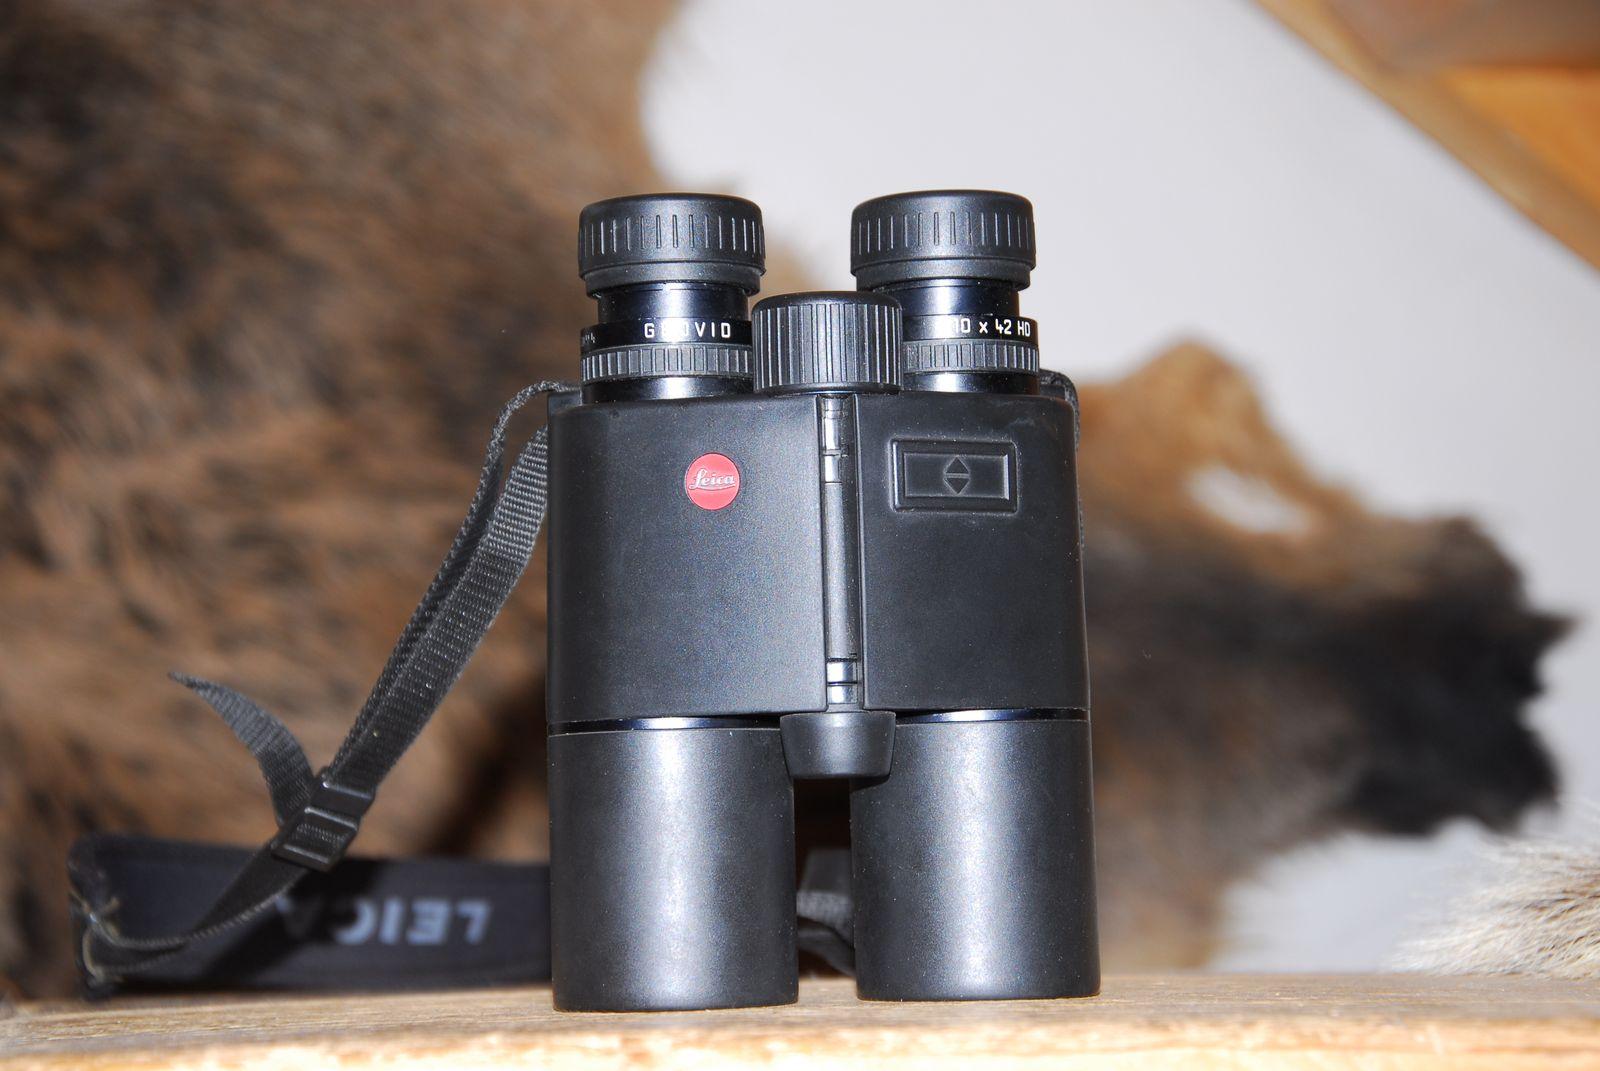 Leica Entfernungsmesser Jagd : Leica geovid 10x42 hd